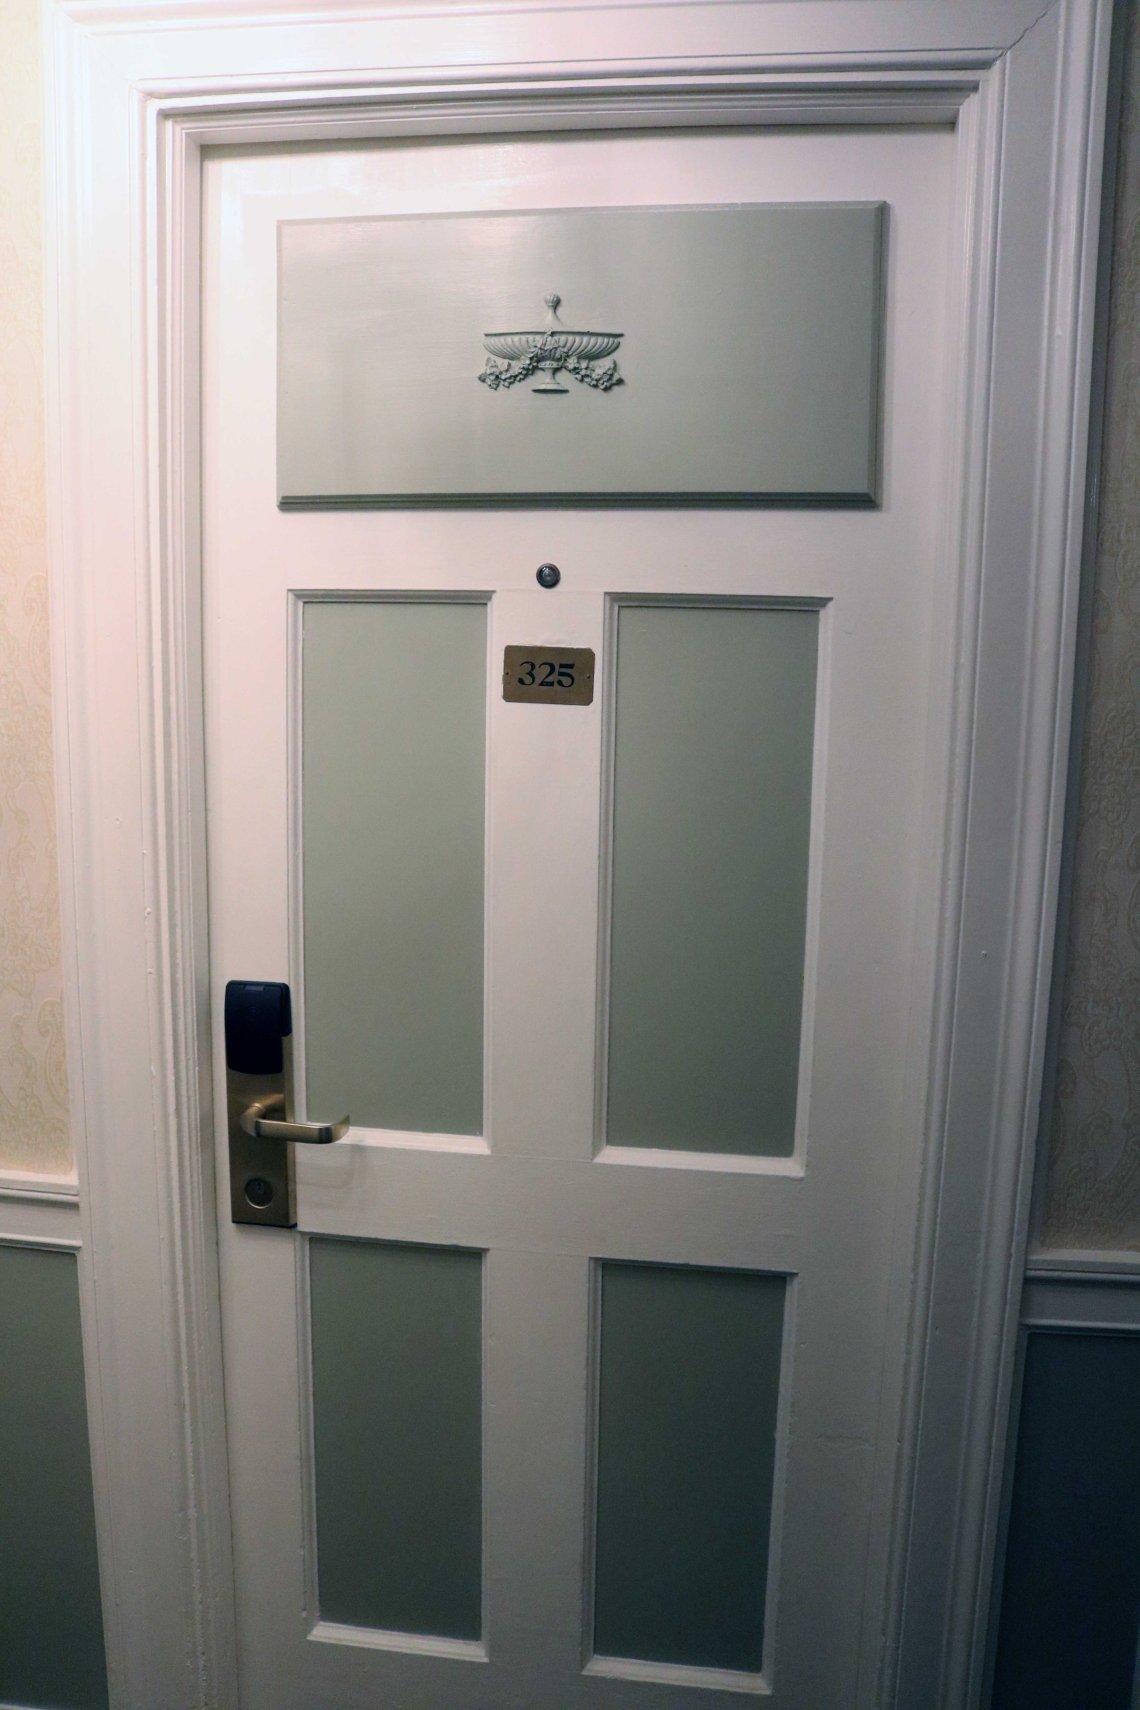 hawthorne hotel room 326